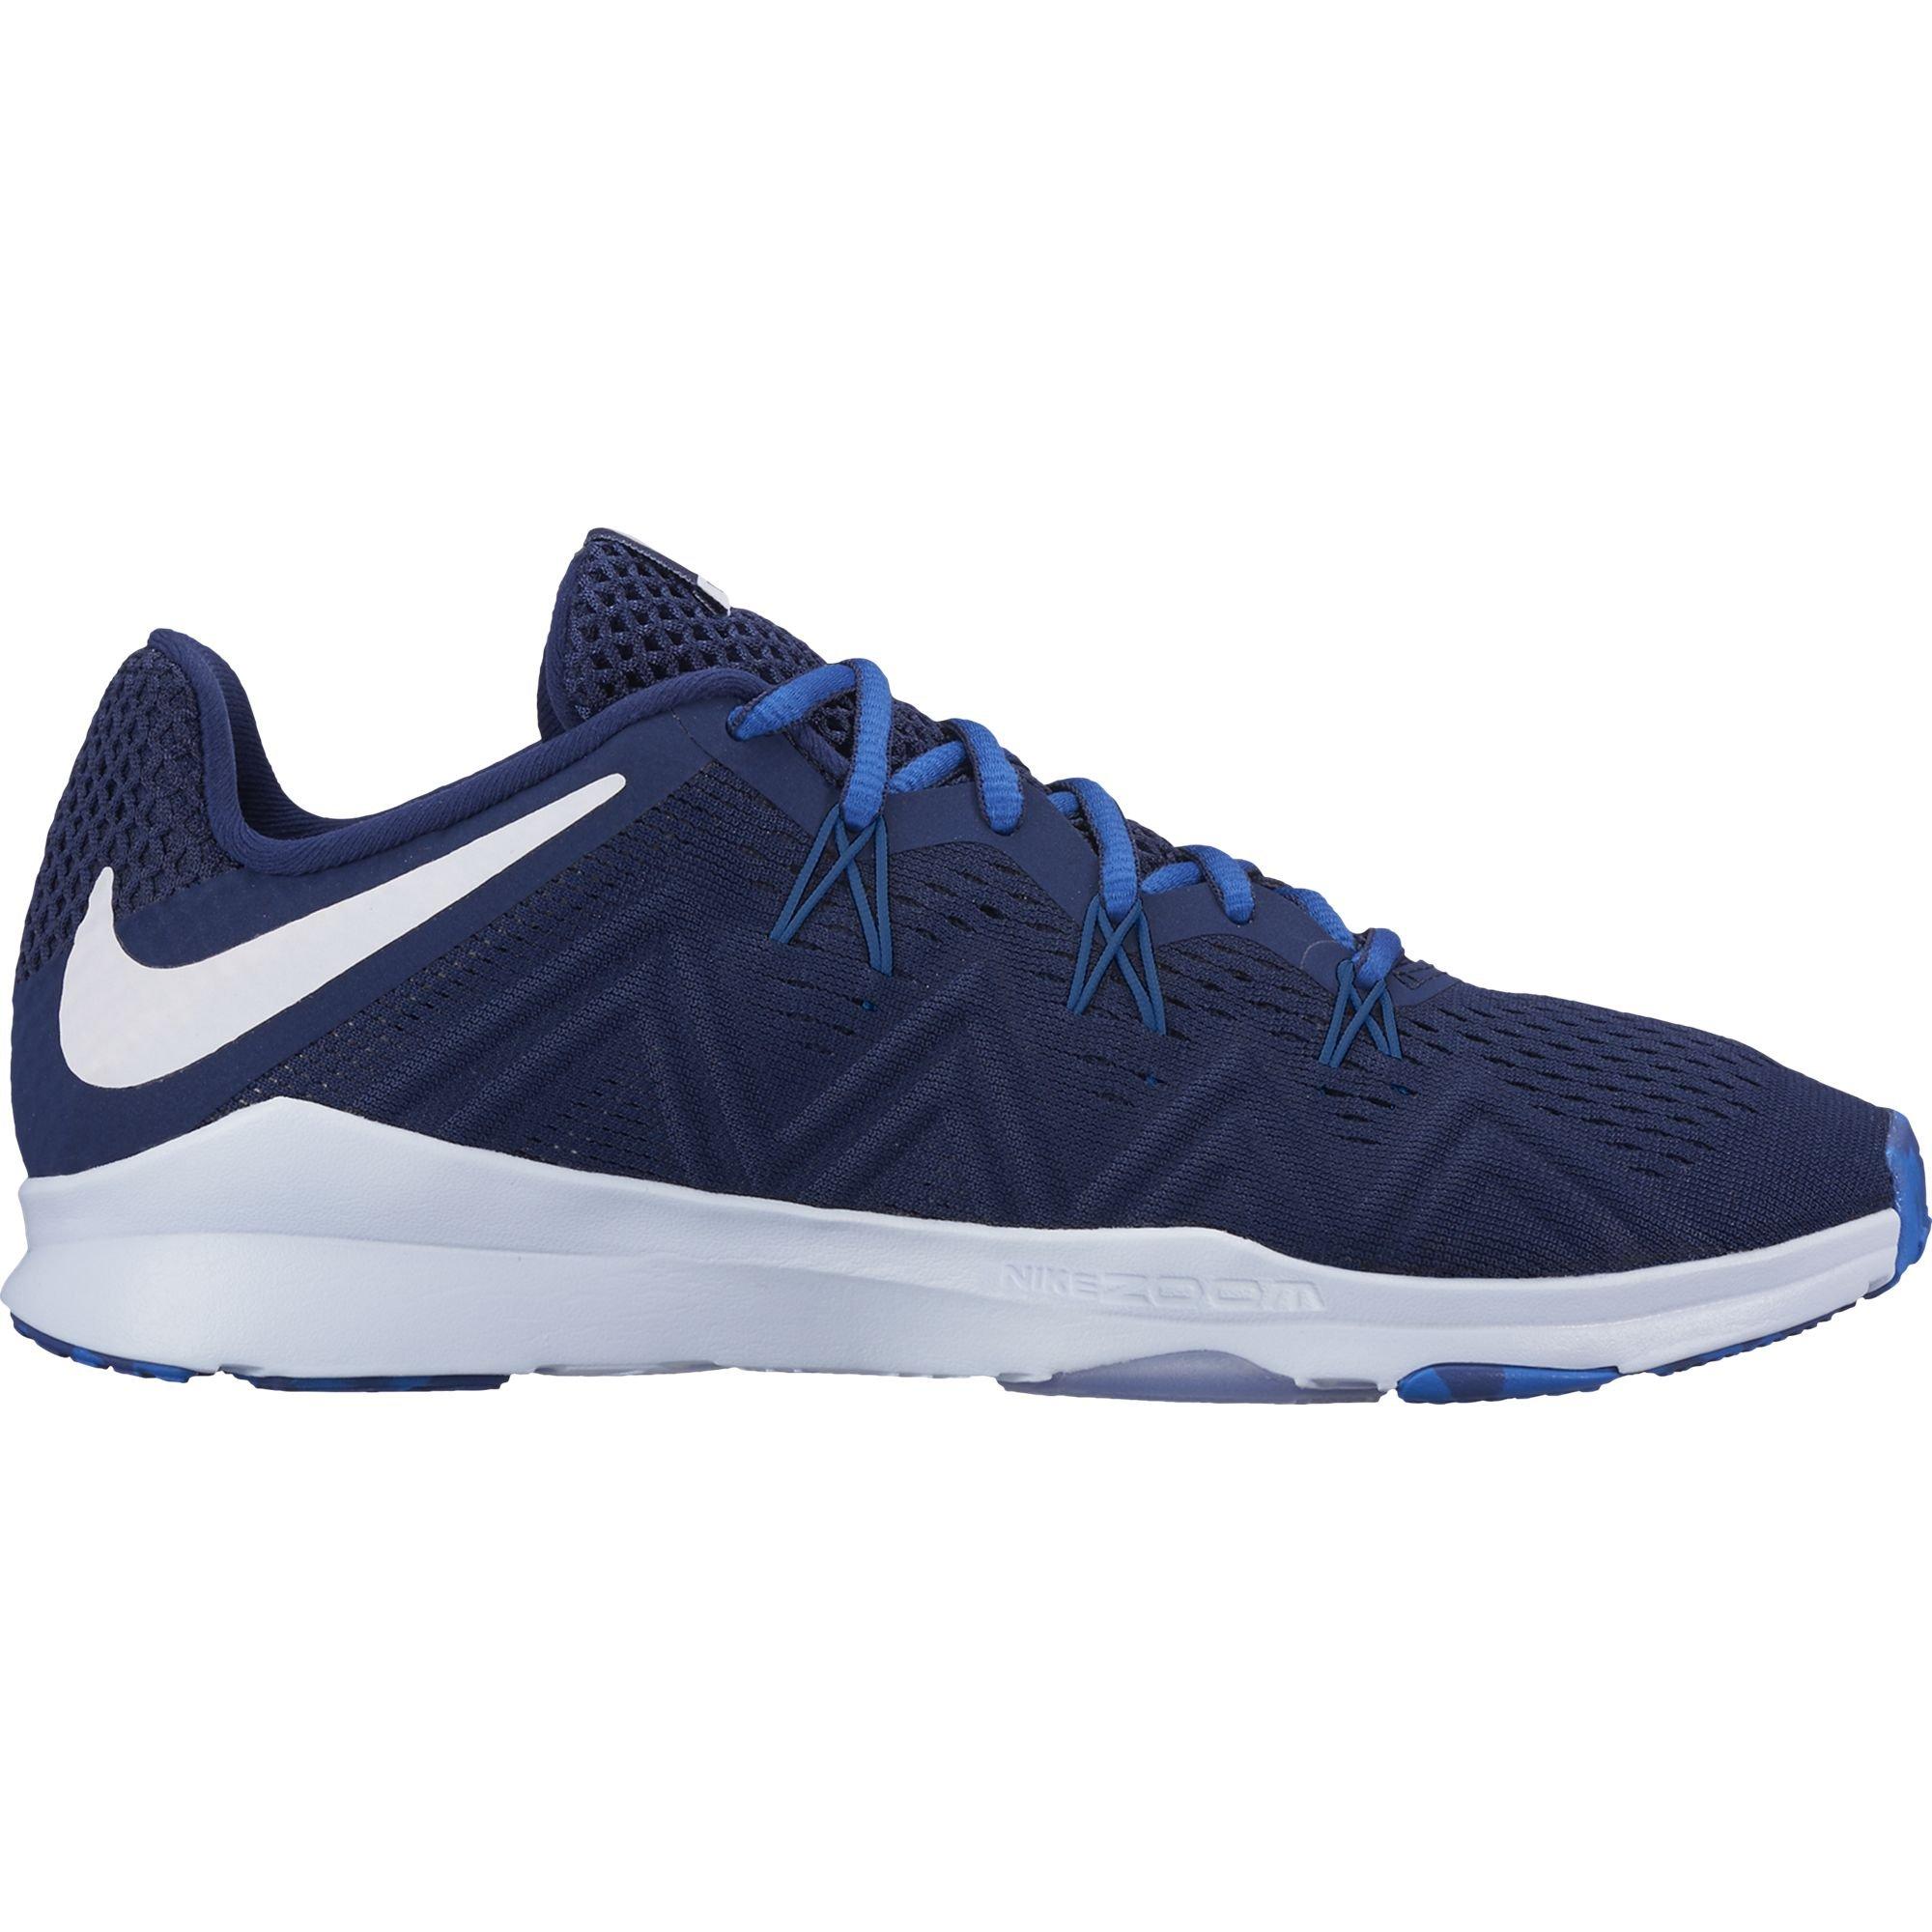 NIKE Women's Air Zoom Condition Indigo Training Shoe Binary Blue/Metallic Silver/Blue Jay Size 8.5 M US